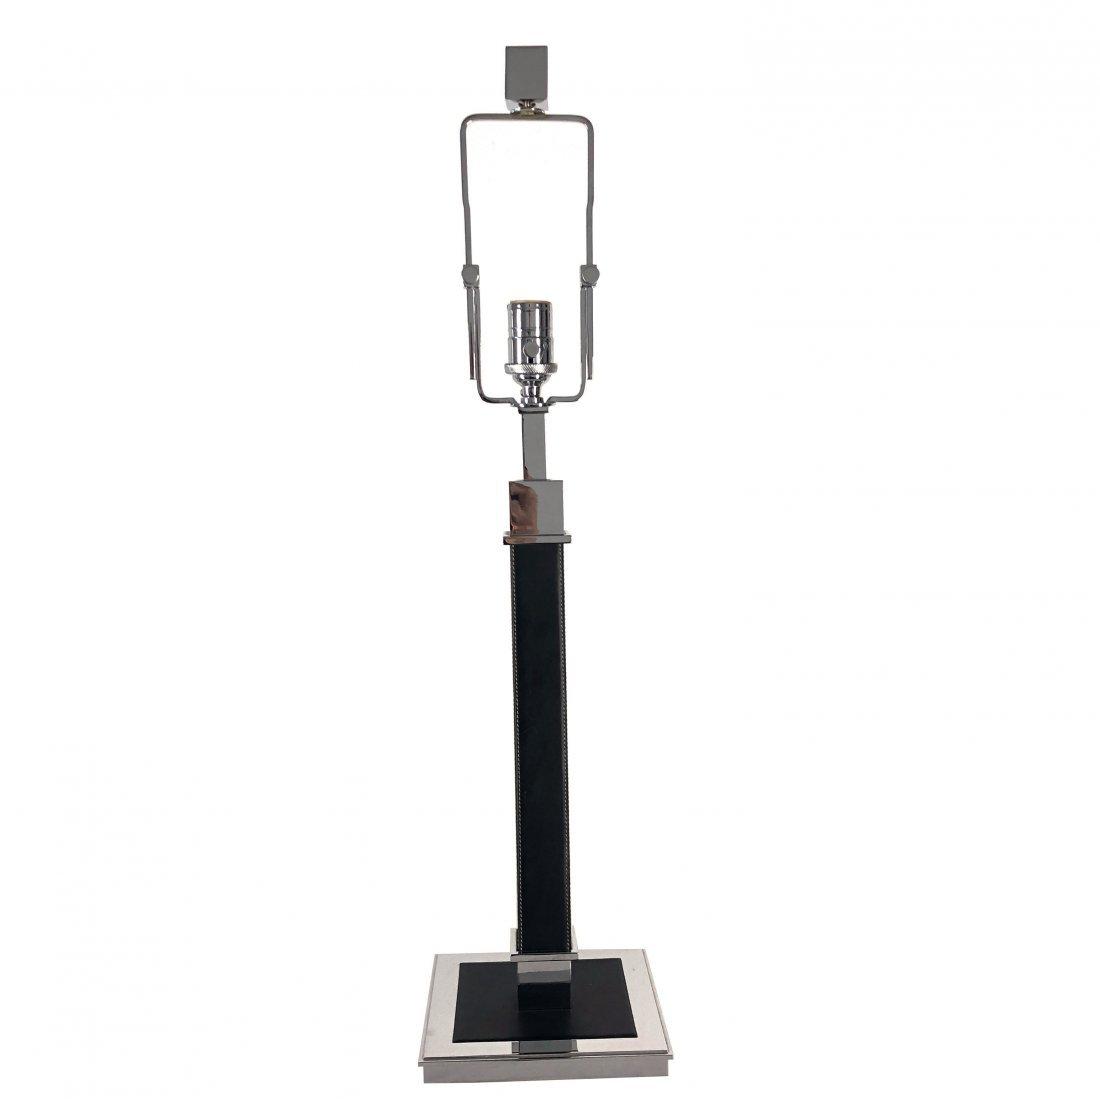 Ralph Lauren Polished Nickel Black Leather Table Lamp - 3